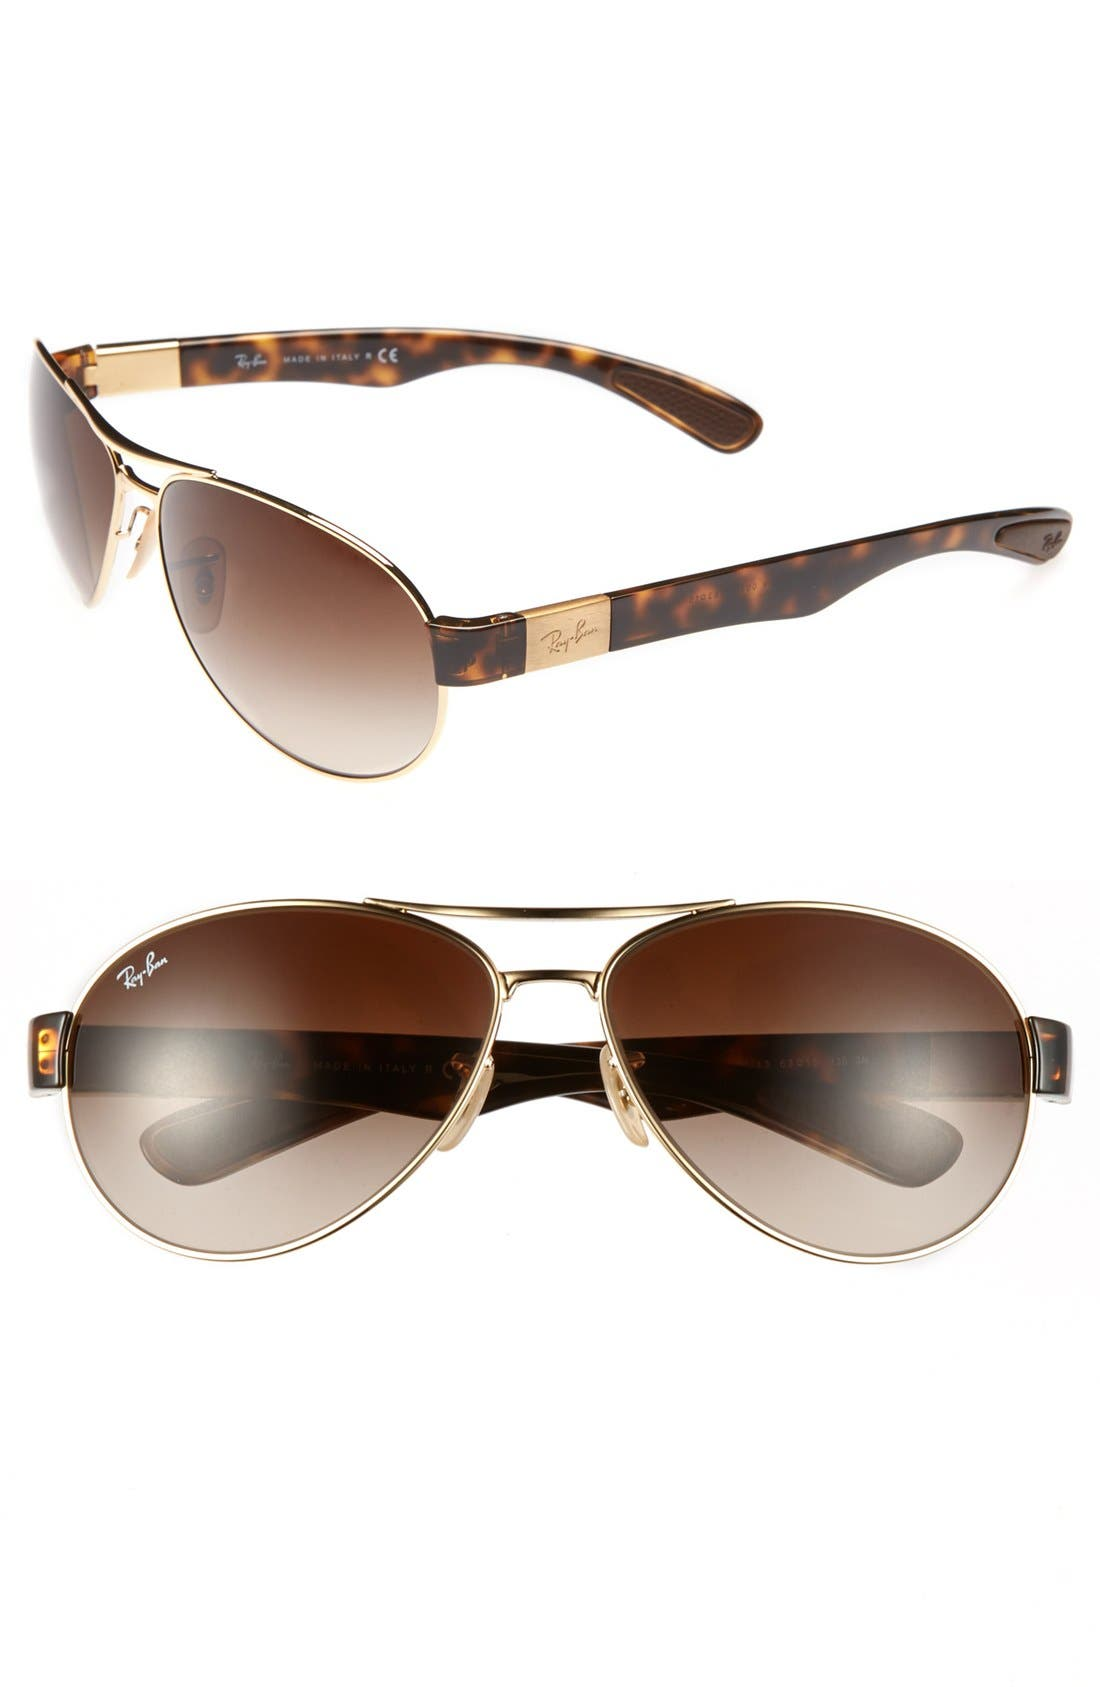 Alternate Image 1 Selected - Ray-Ban 'Pilot' Sunglasses